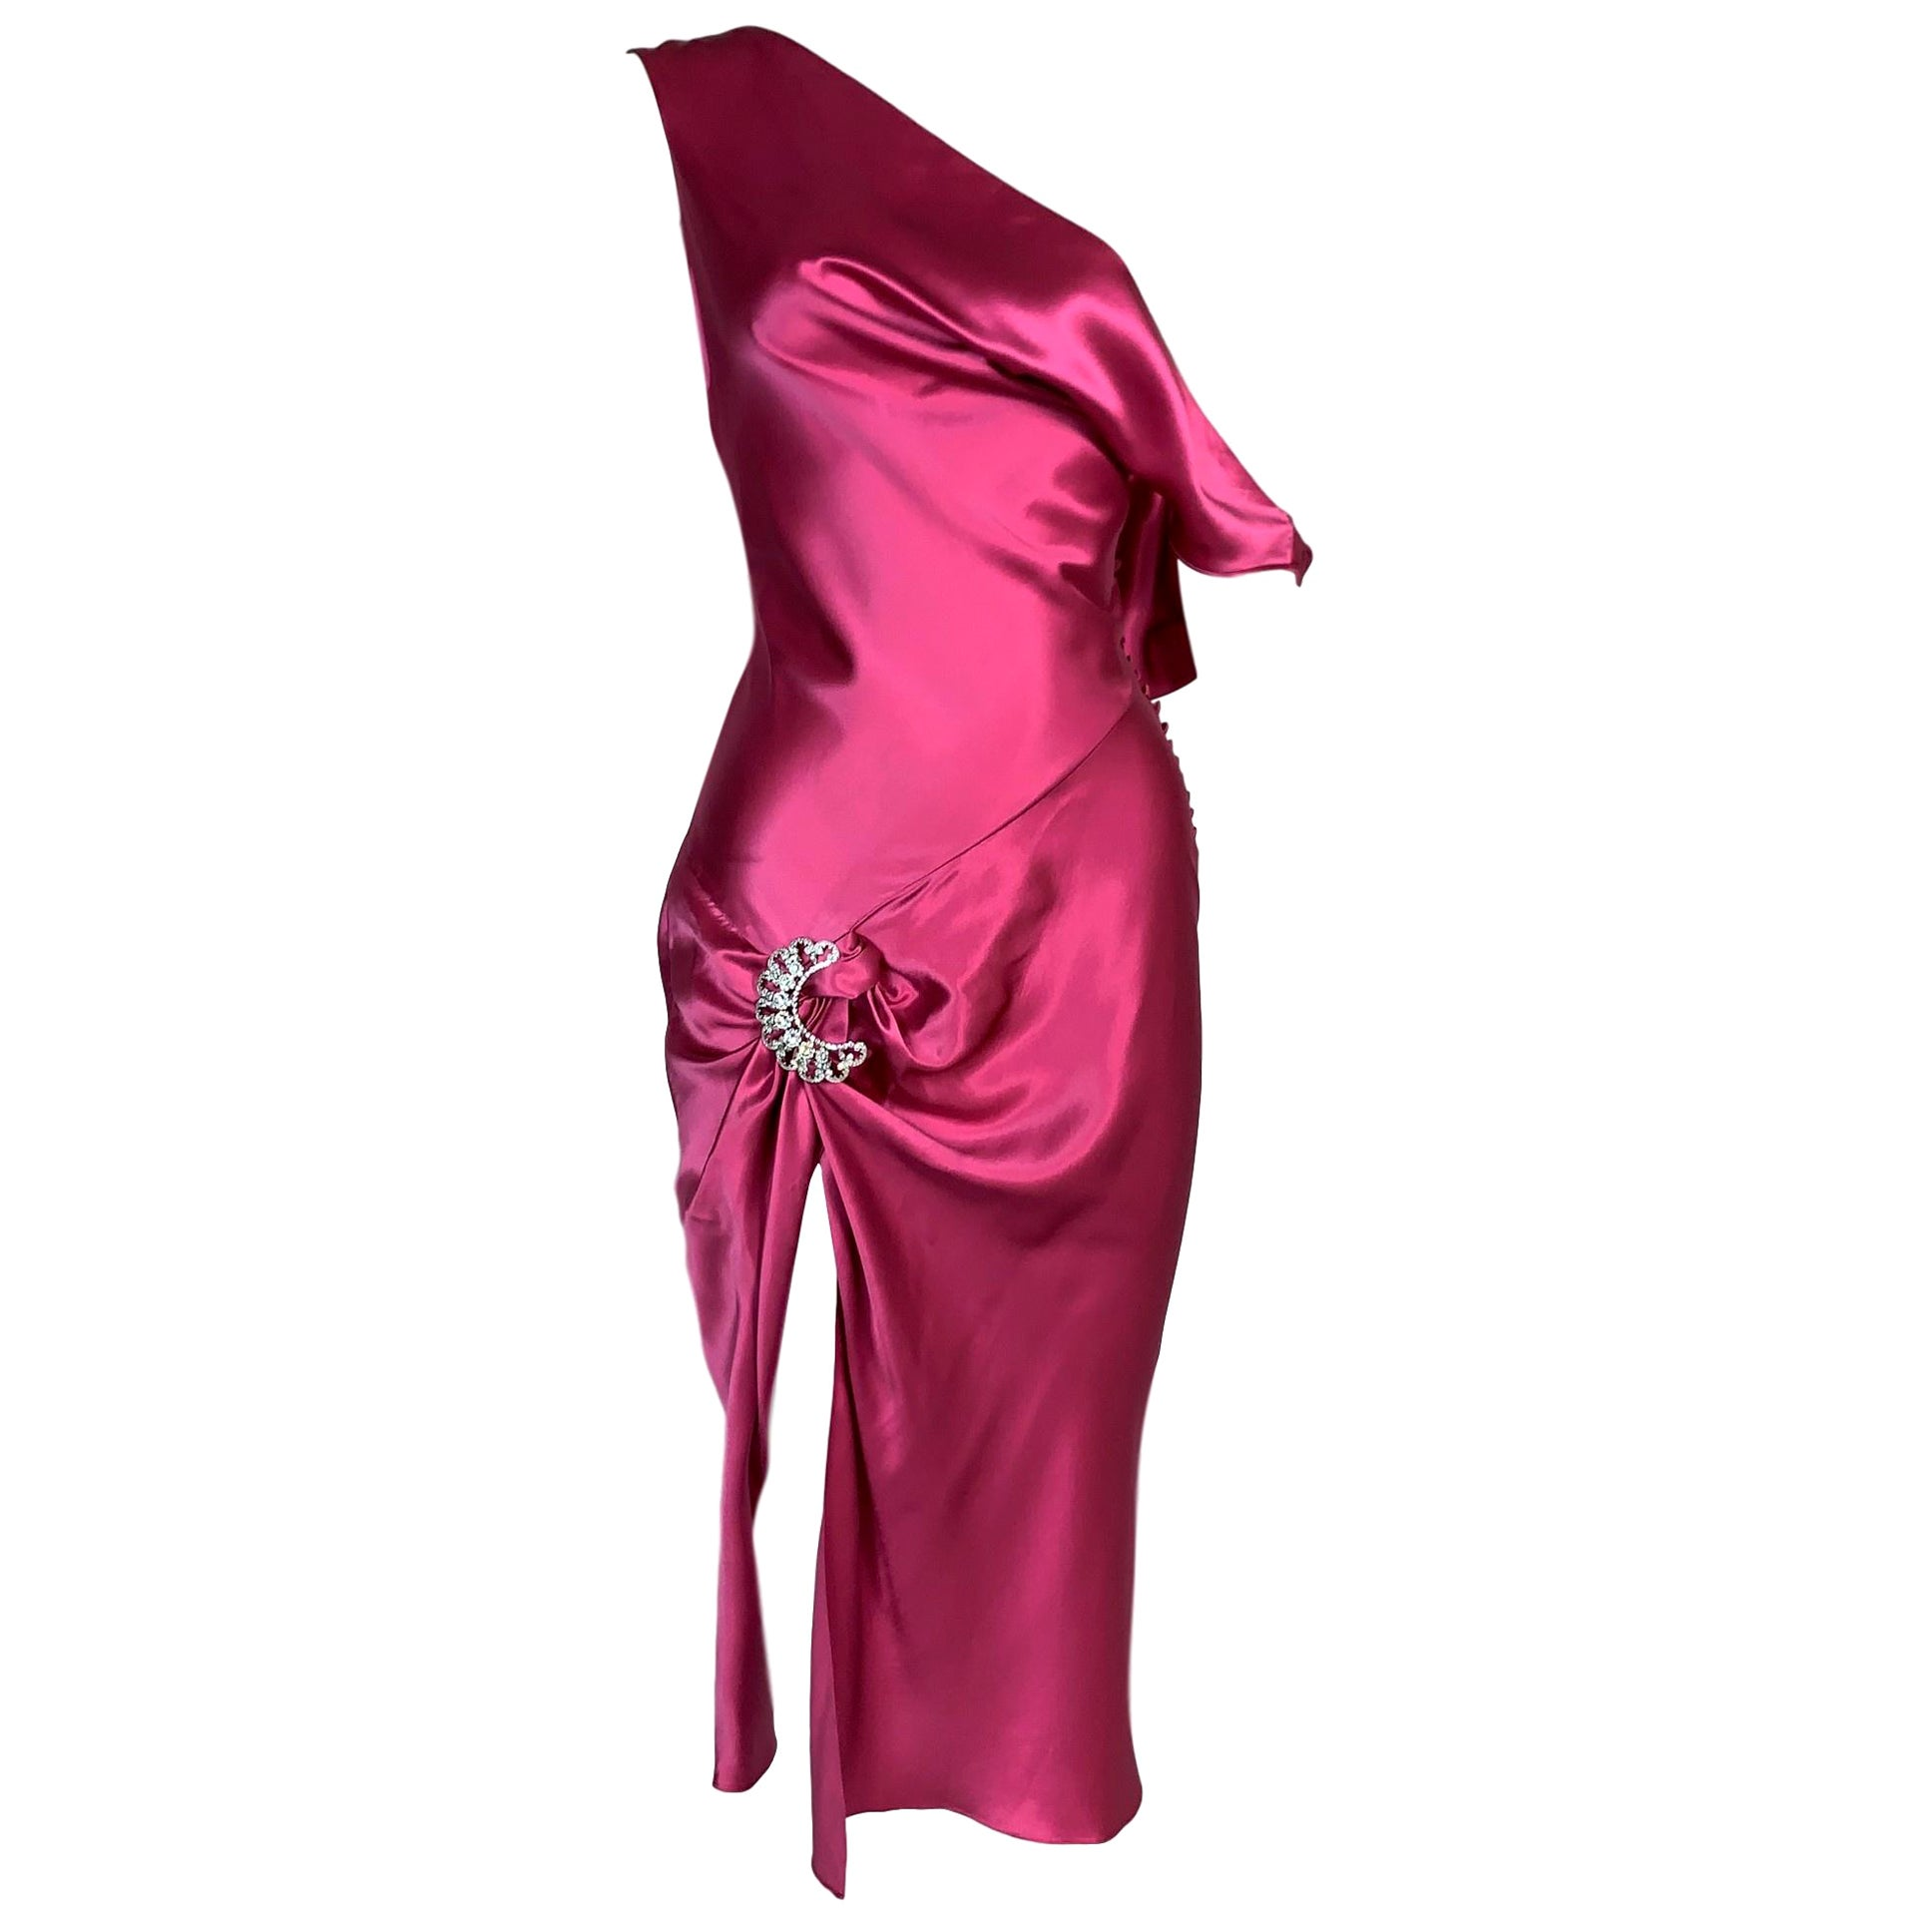 F/W 2004 Christian Dior John Galliano Hot Pink Satin High Slit Dress